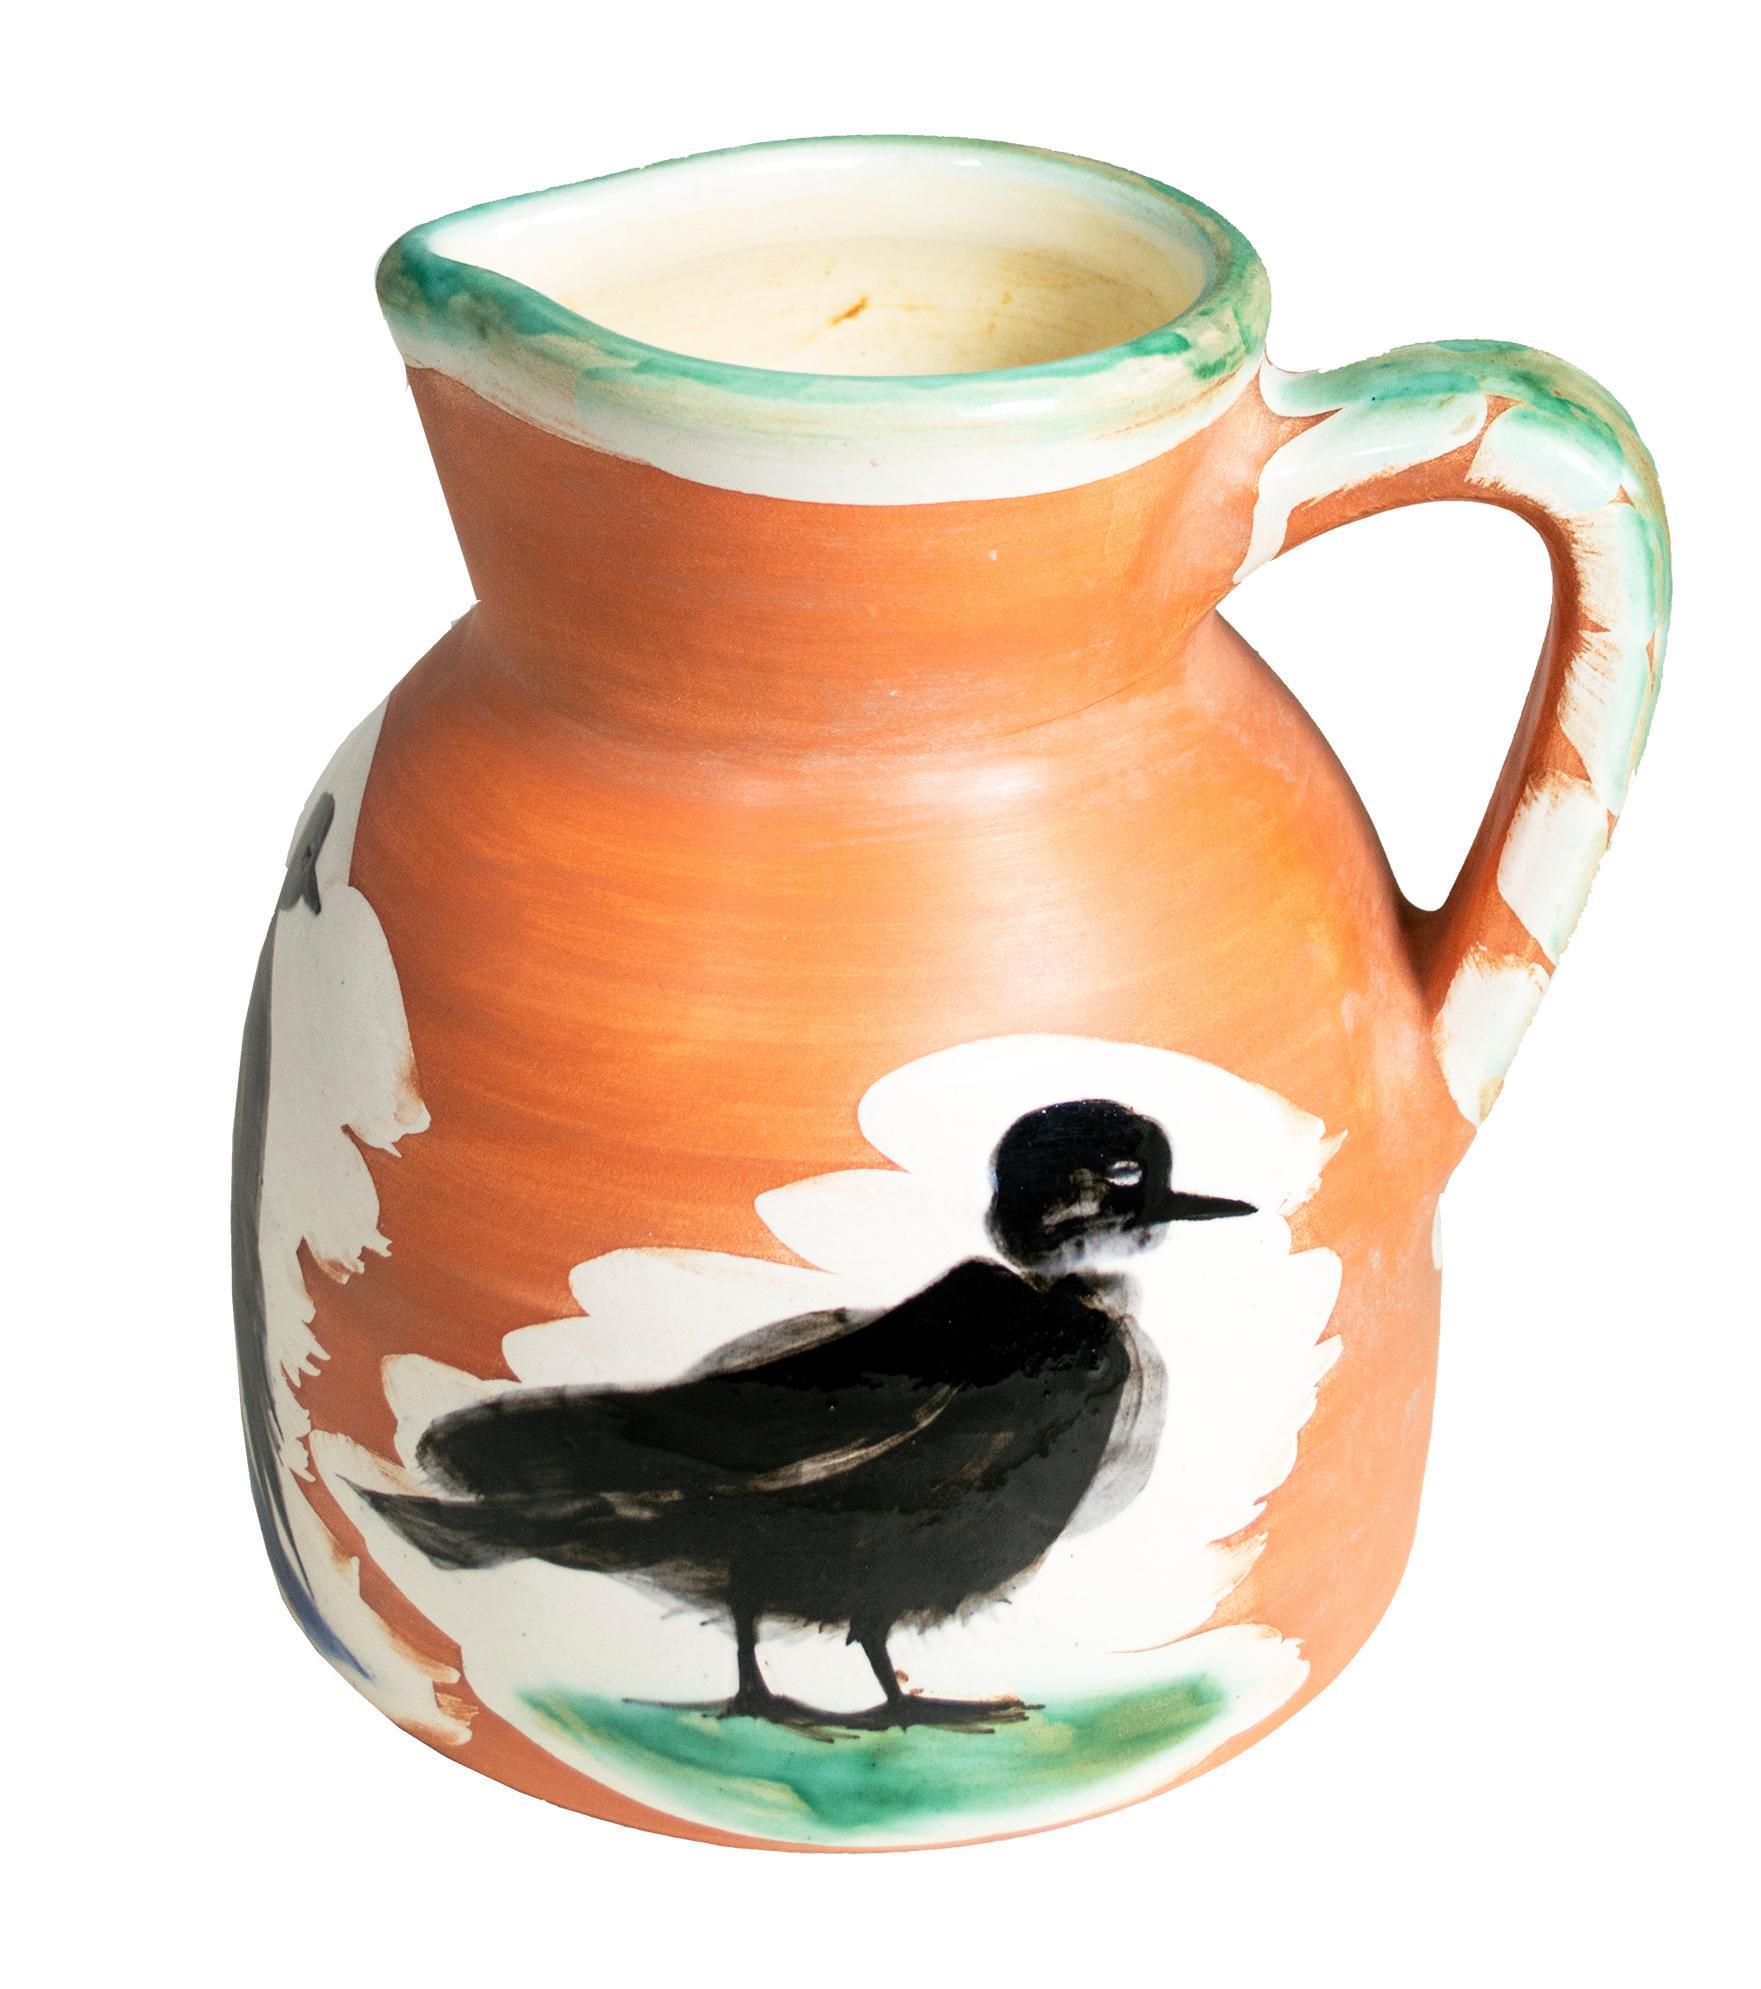 'Pitcher with Birds' original Madoura ceramic turned pitcher, Edition Picasso